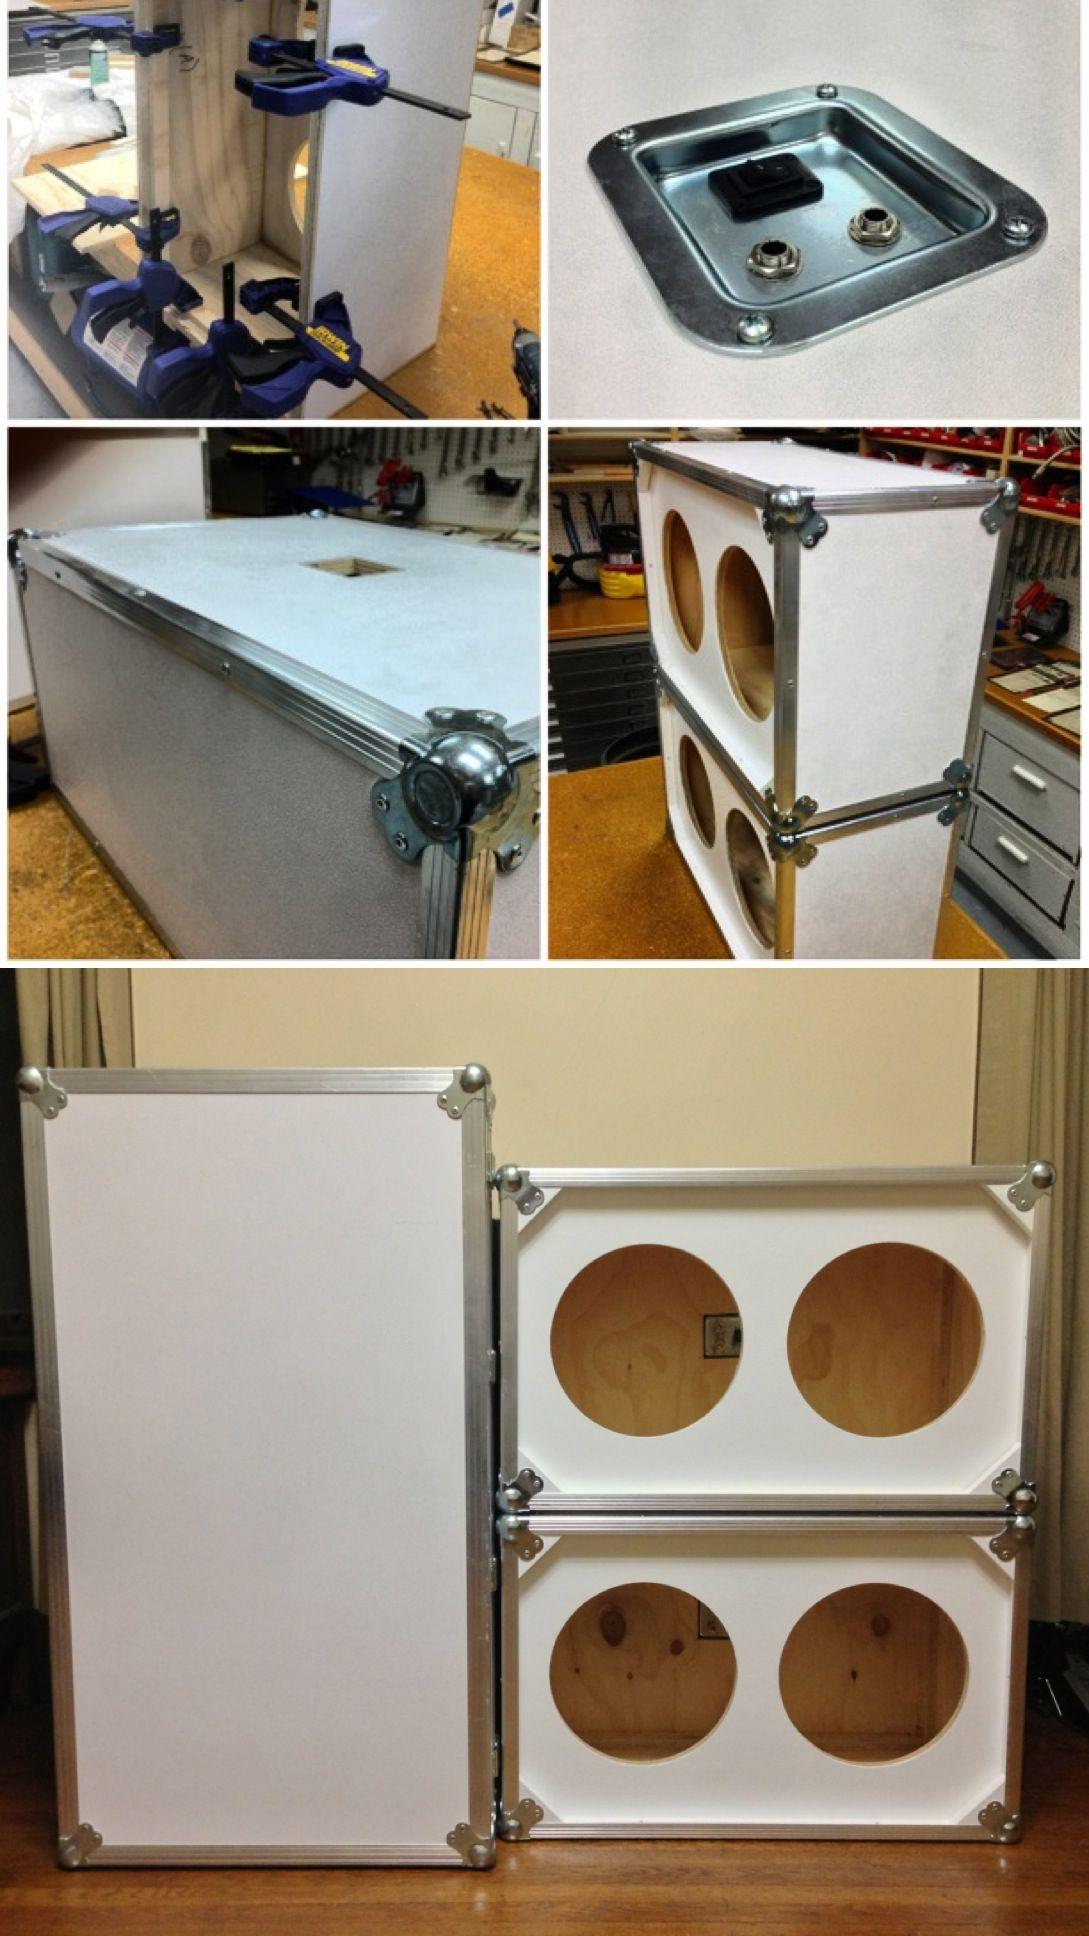 diy custom 2x12 guitar speaker cabinets carpentry guitar cabinet bass amps diy speakers. Black Bedroom Furniture Sets. Home Design Ideas